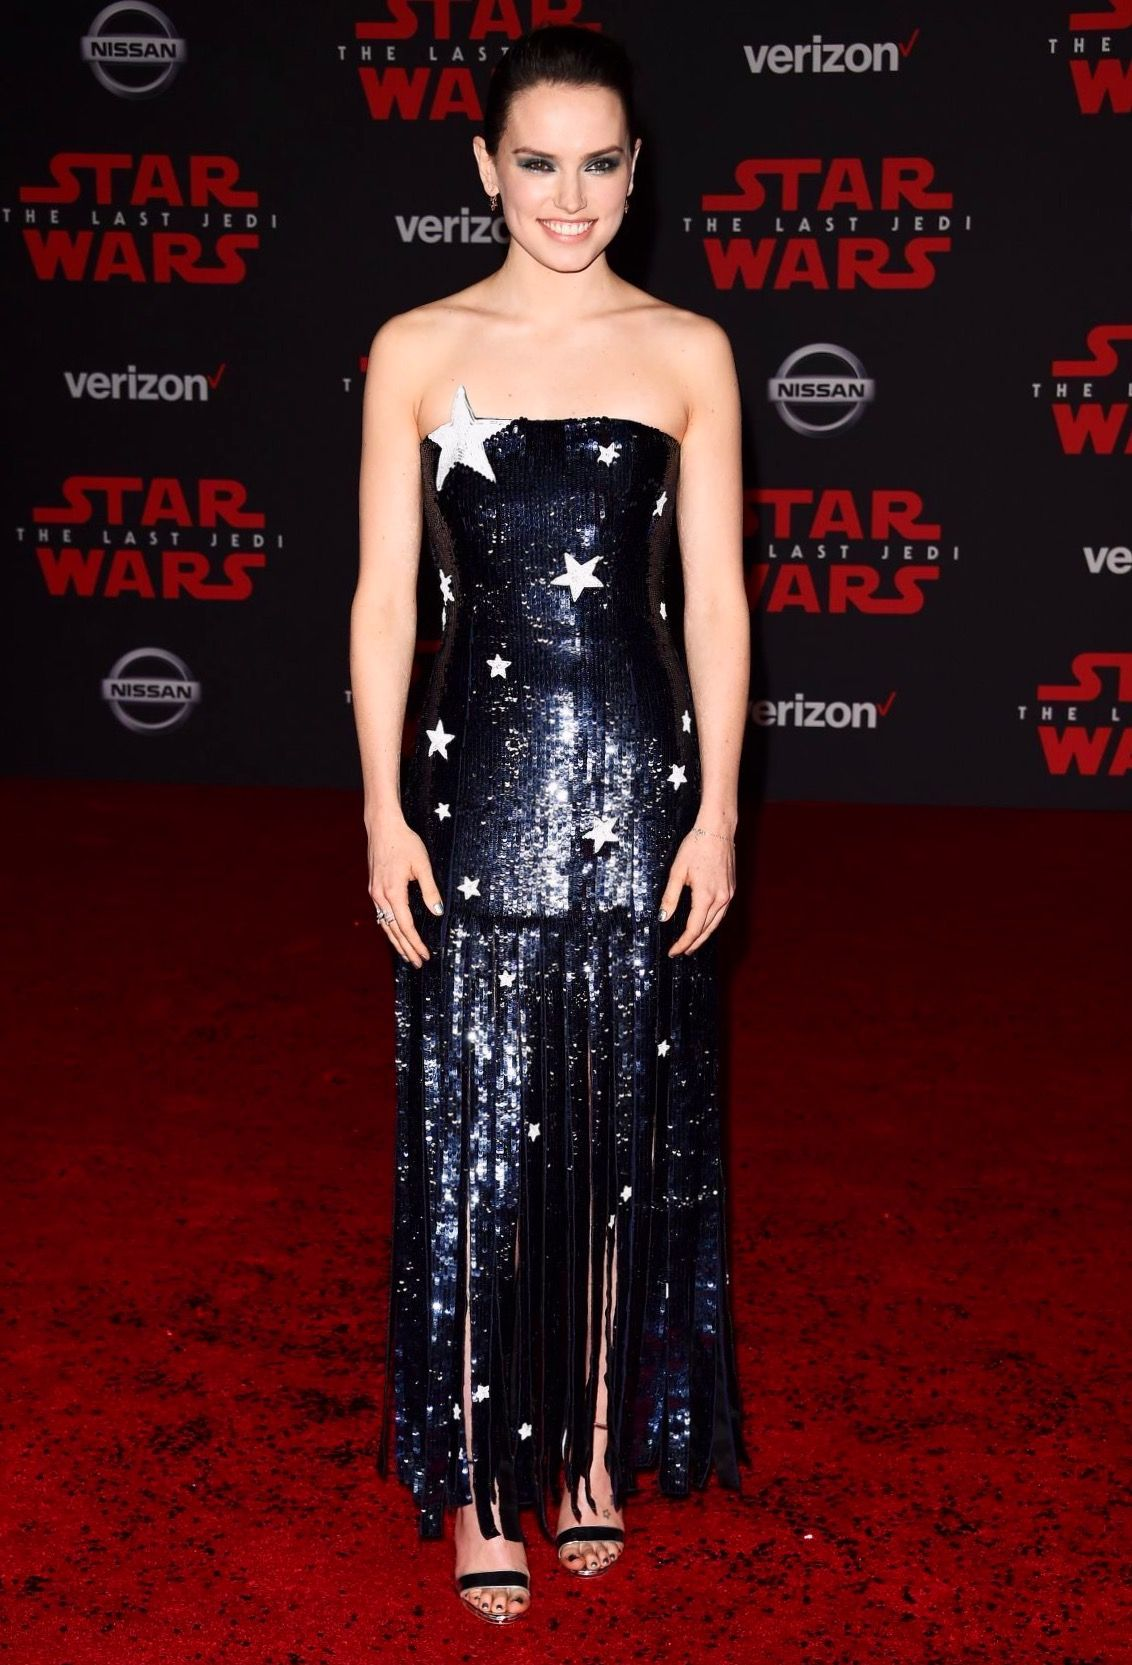 Star Wars Premiere 7 shook the world - photos